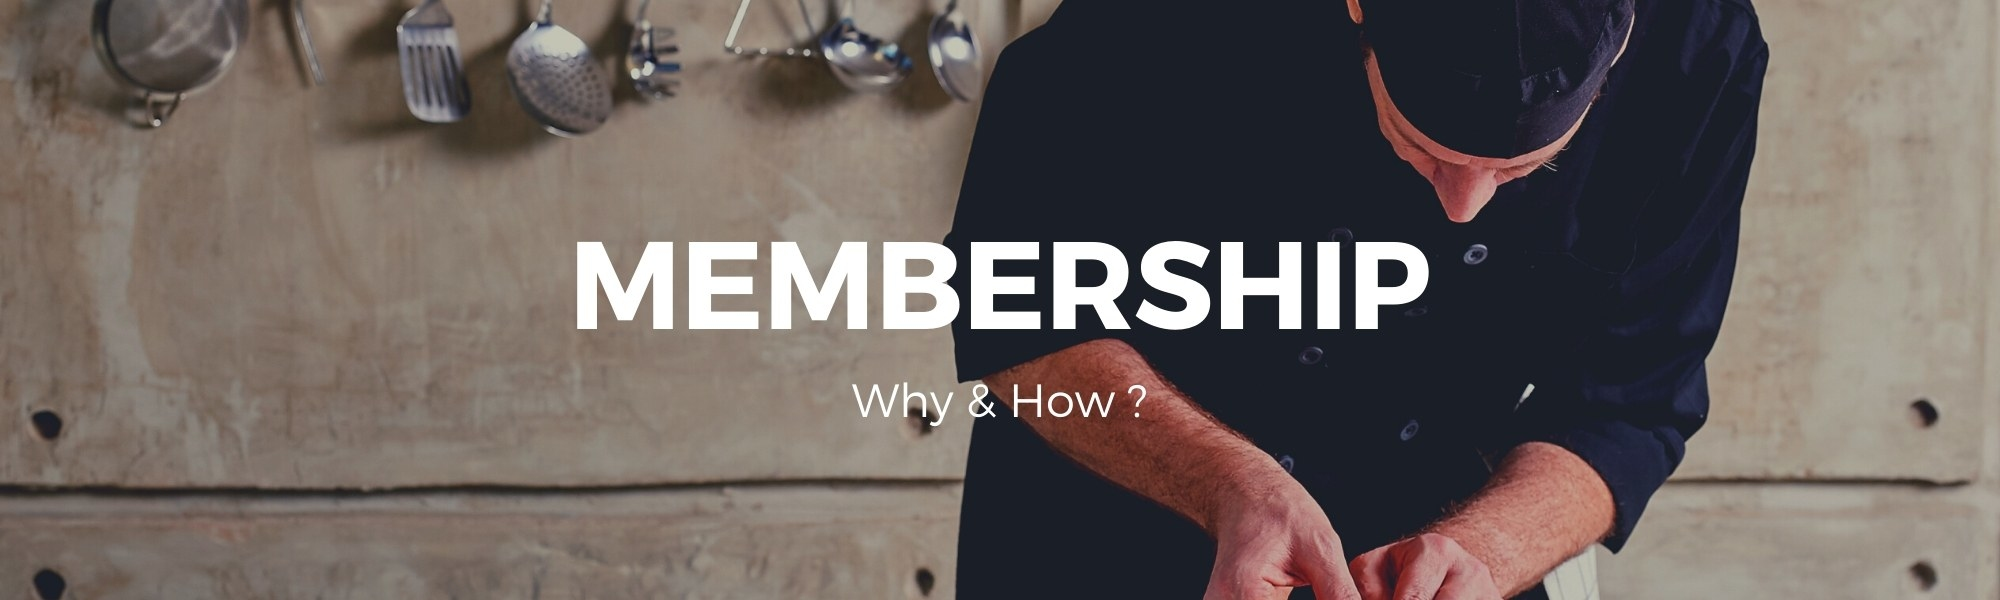 Accesswine.hk membership program